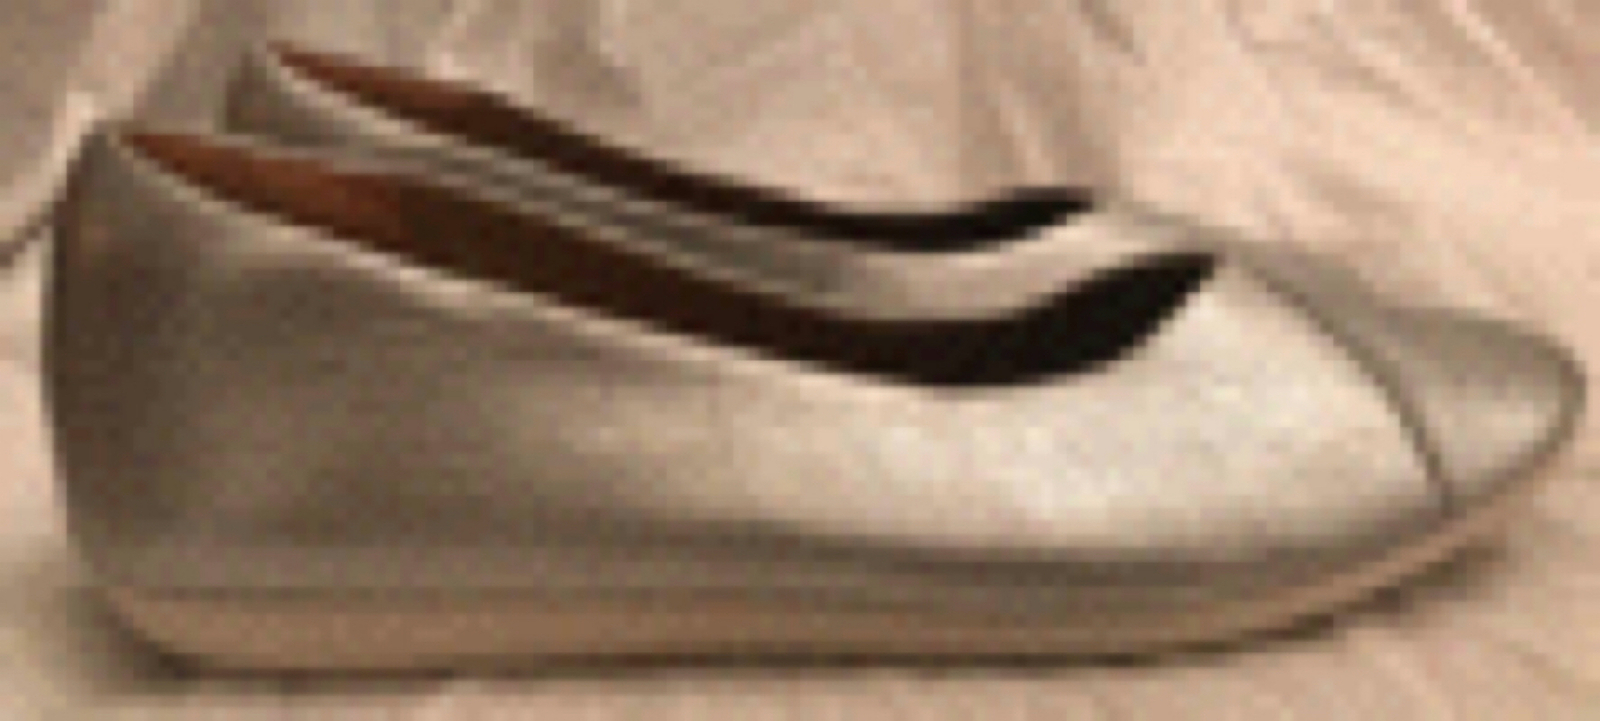 Clarks Artisan Women's 8.5M Ballet Flats Metallic Leather Silver